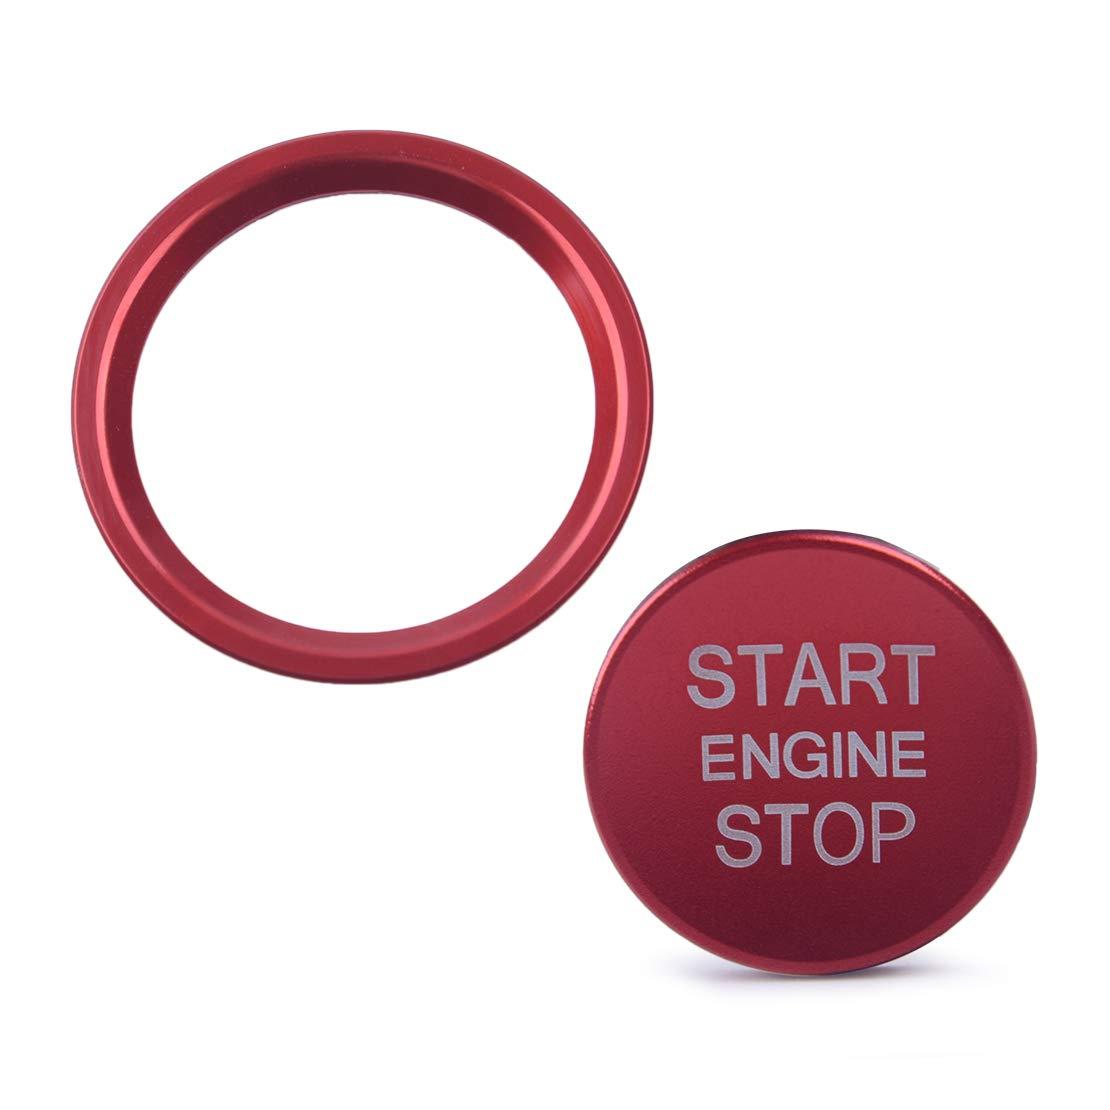 CITALL 2PCS/Set Car Motor Start Stop Schalter Drucktastenabdeckung & Ringverkleidung Aufkleber Silber sitao